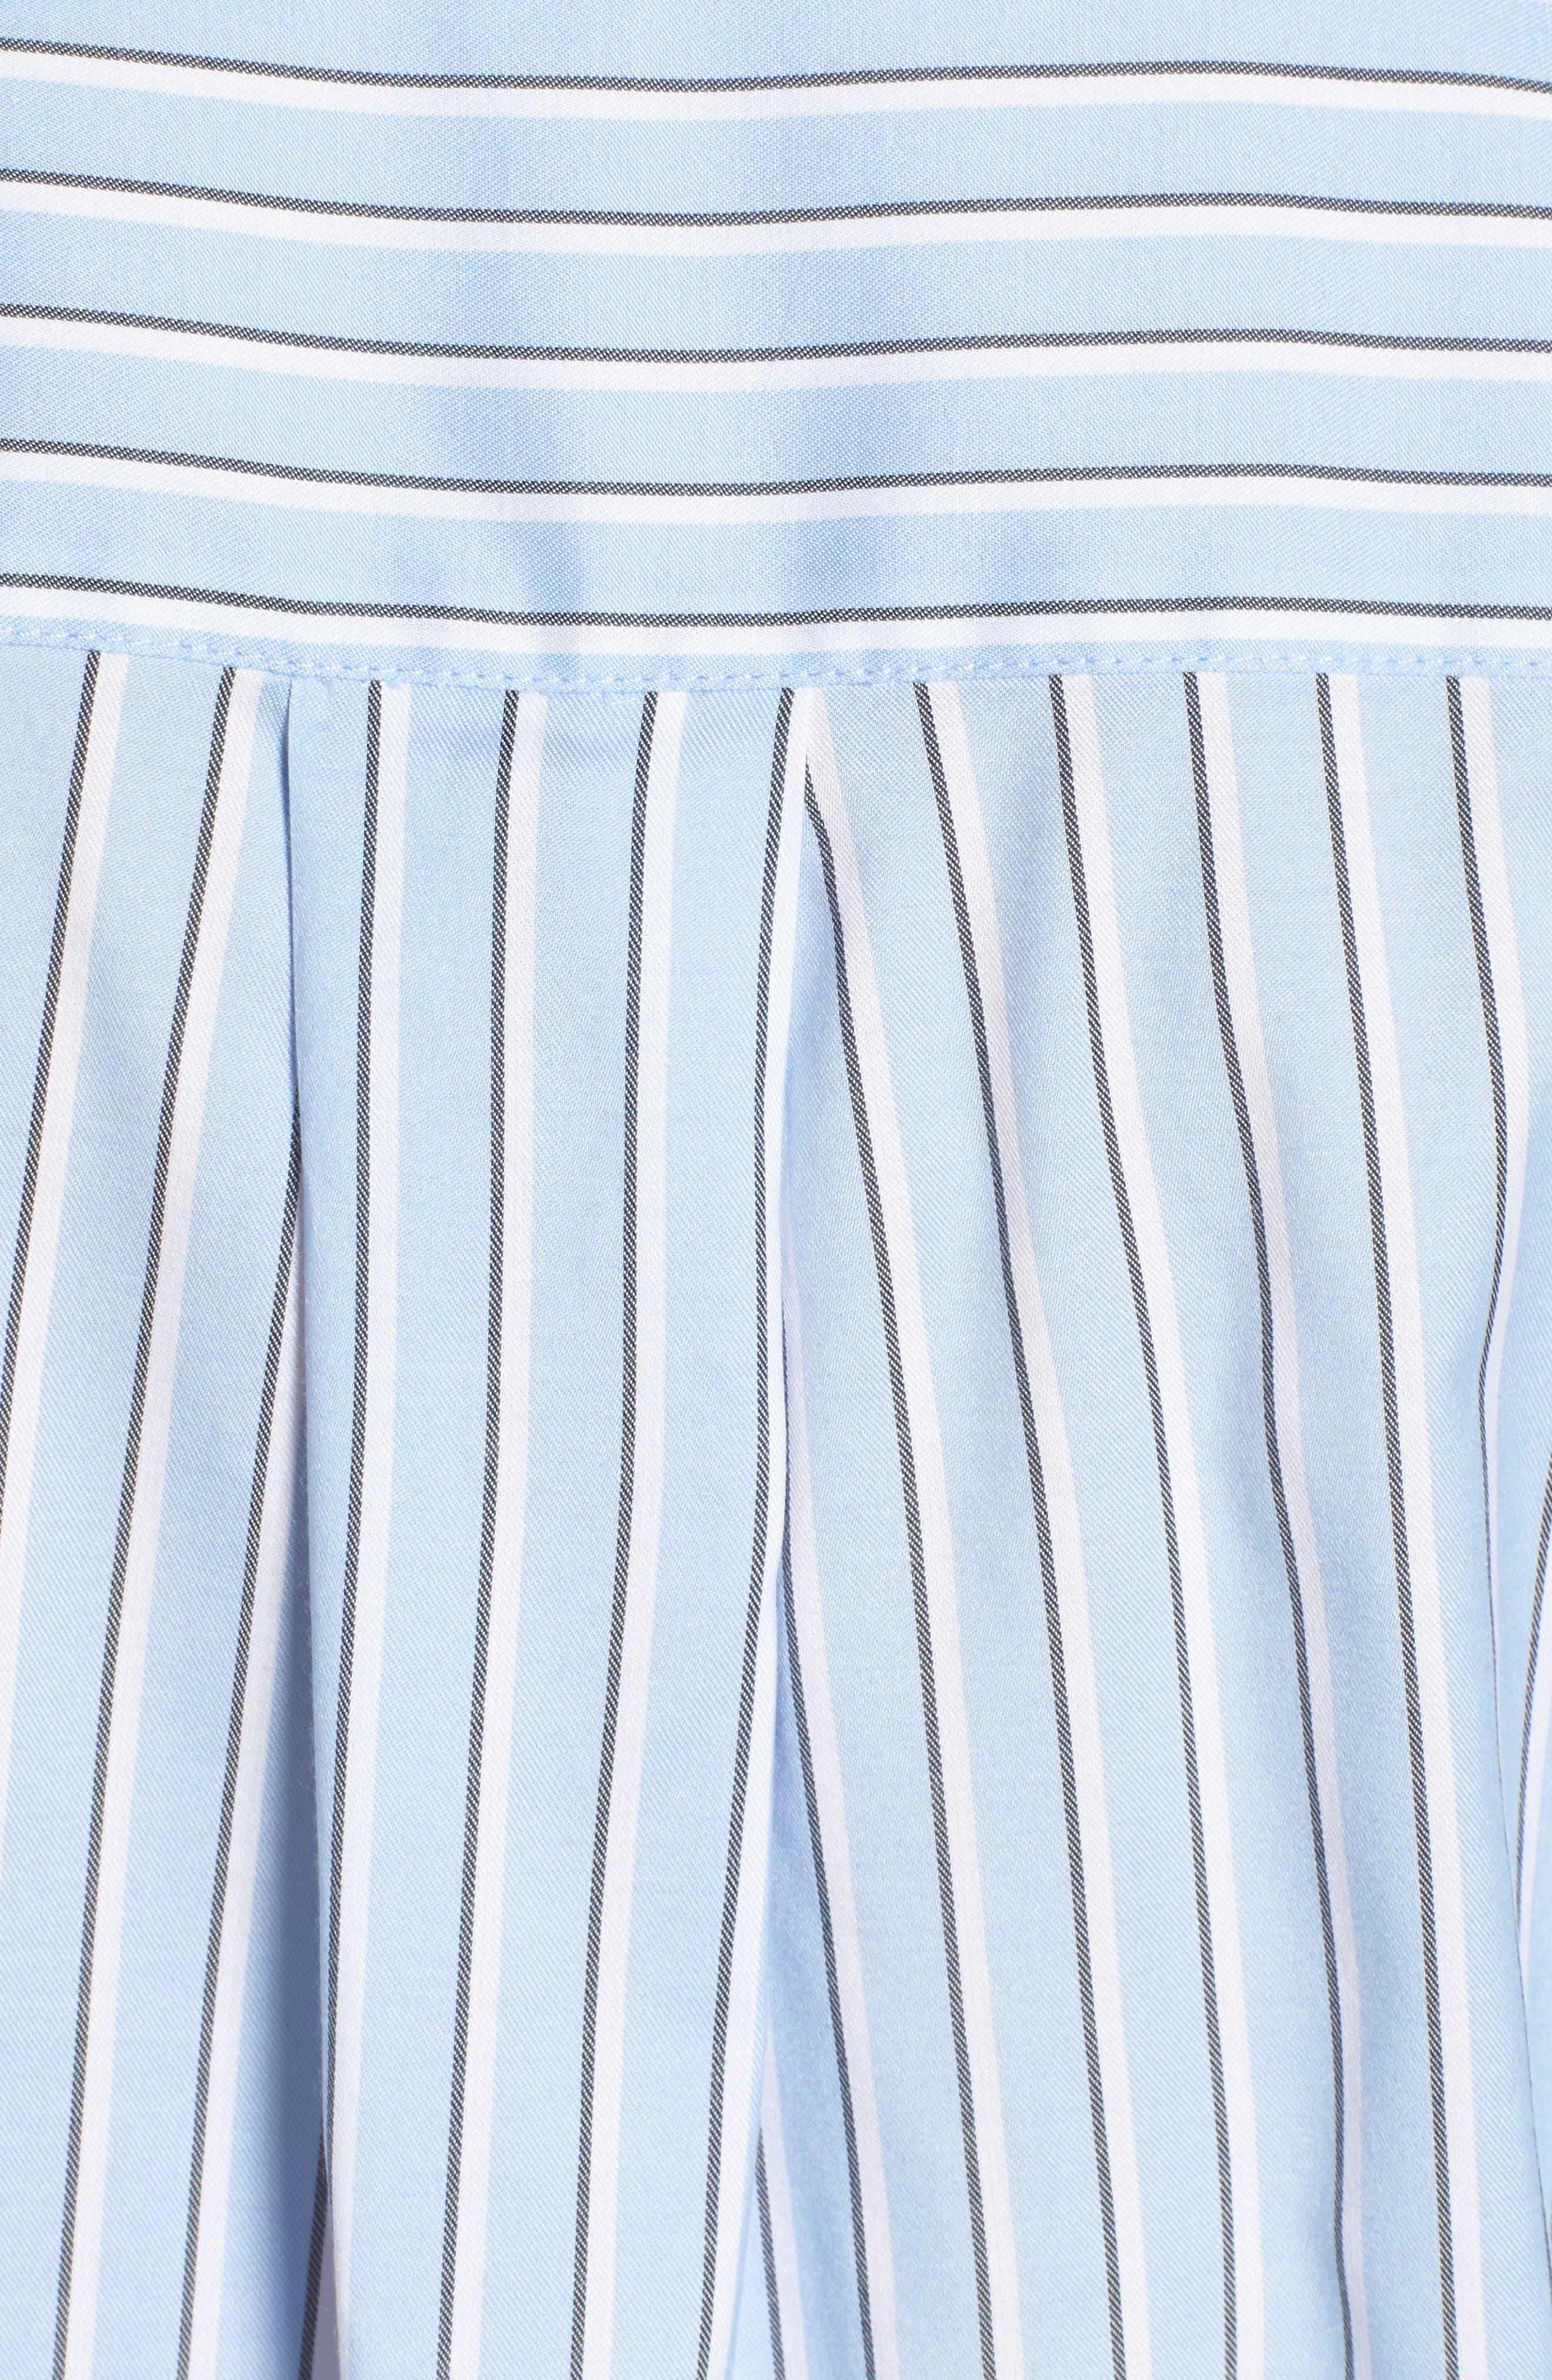 Stripe Button Front Shirt,                             Alternate thumbnail 5, color,                             Blue Brunnera Groove Stripe